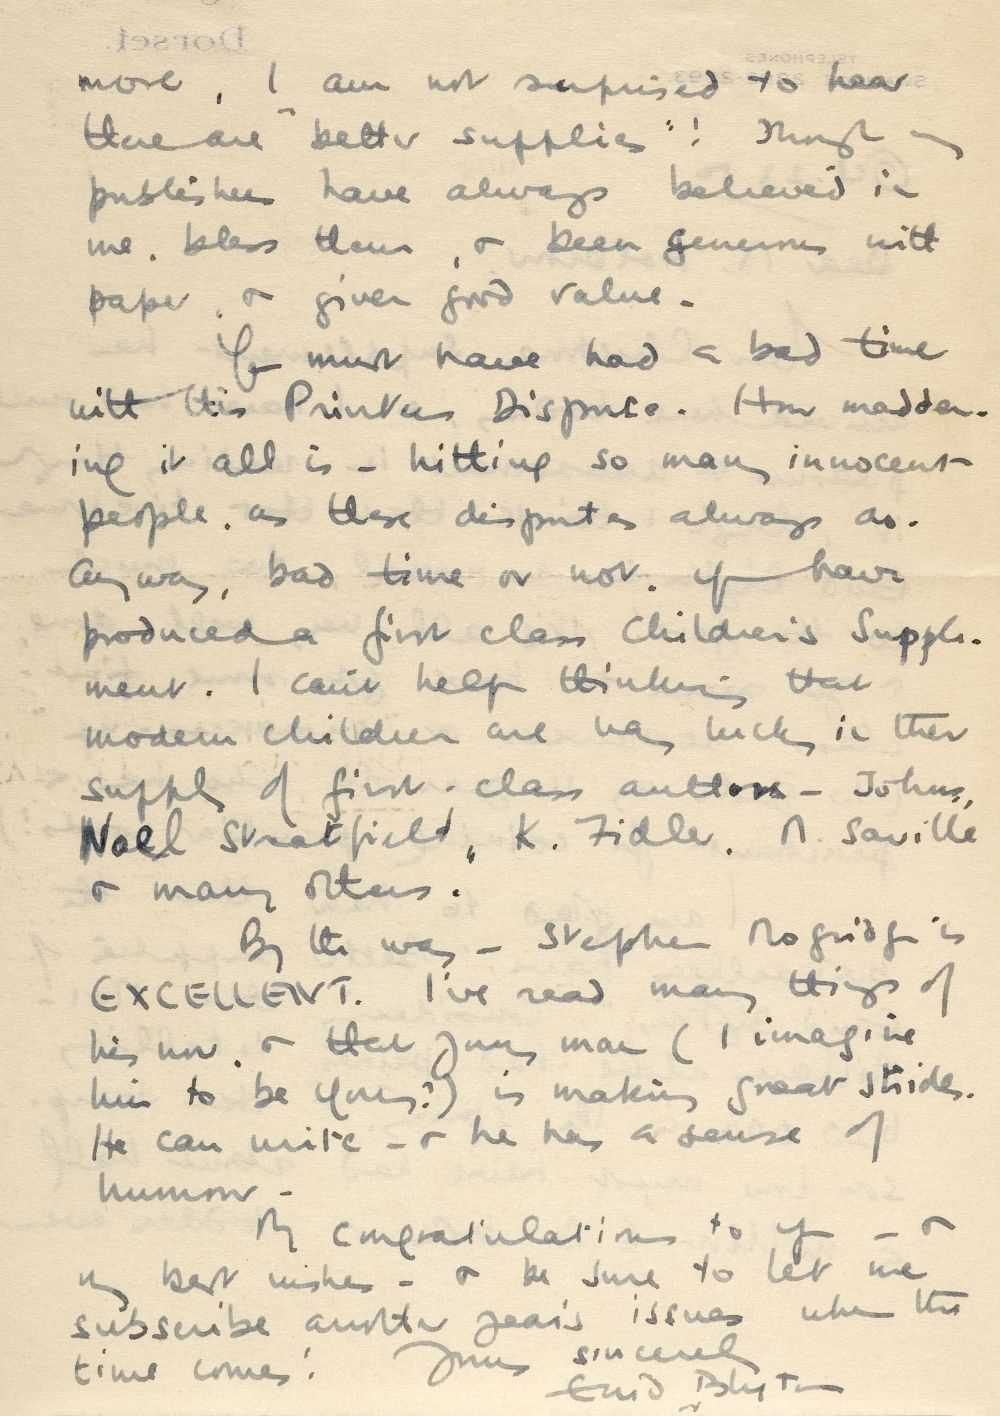 Lot 584 - Blyton (Enid, 1897-1968). Autograph letter signed, 23 October 1950